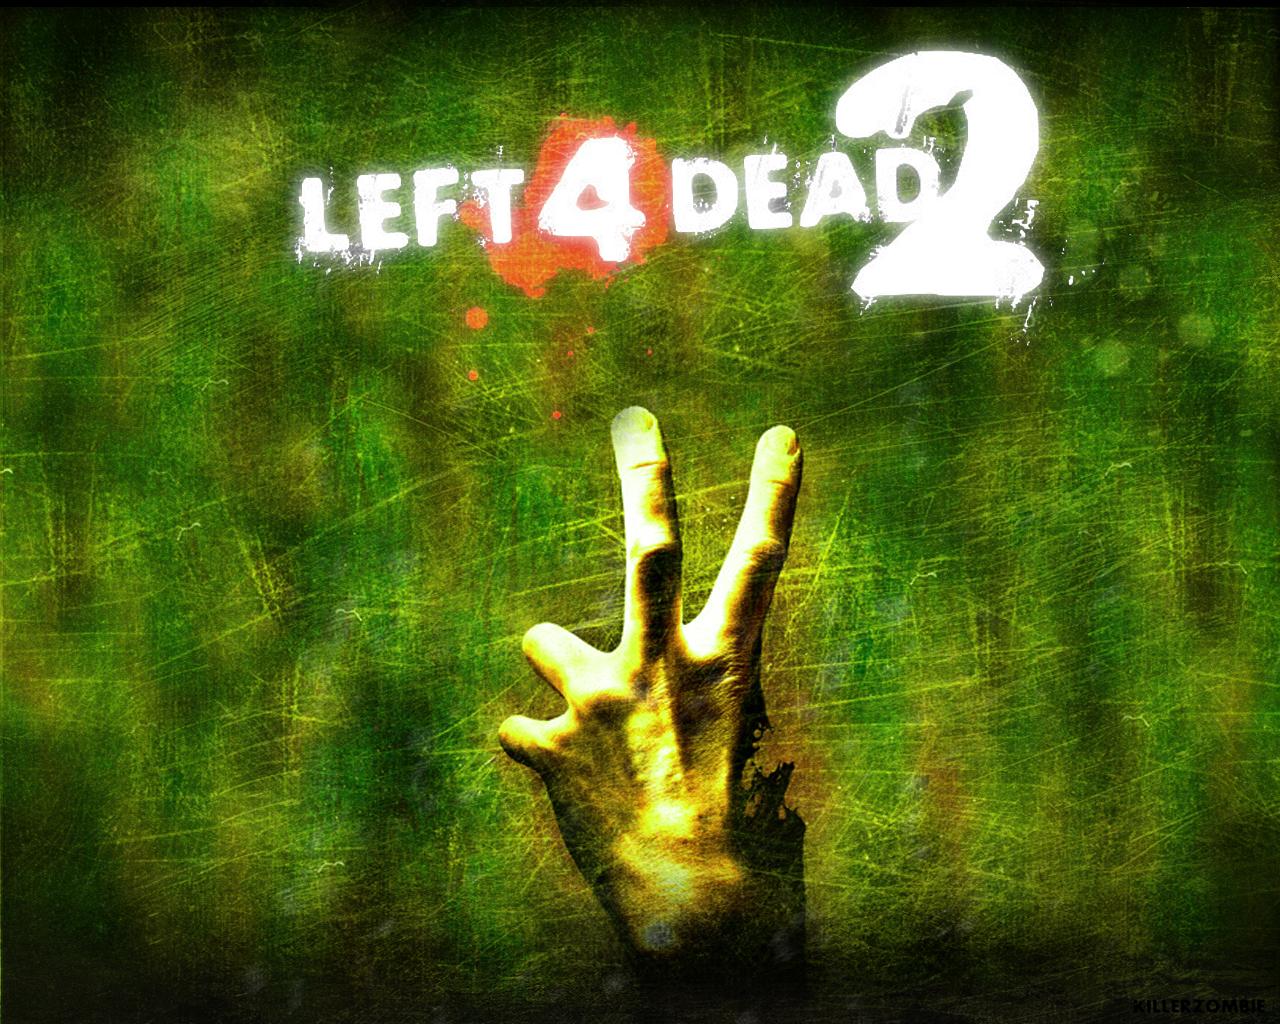 Imágenes De Left 4 Dead 2